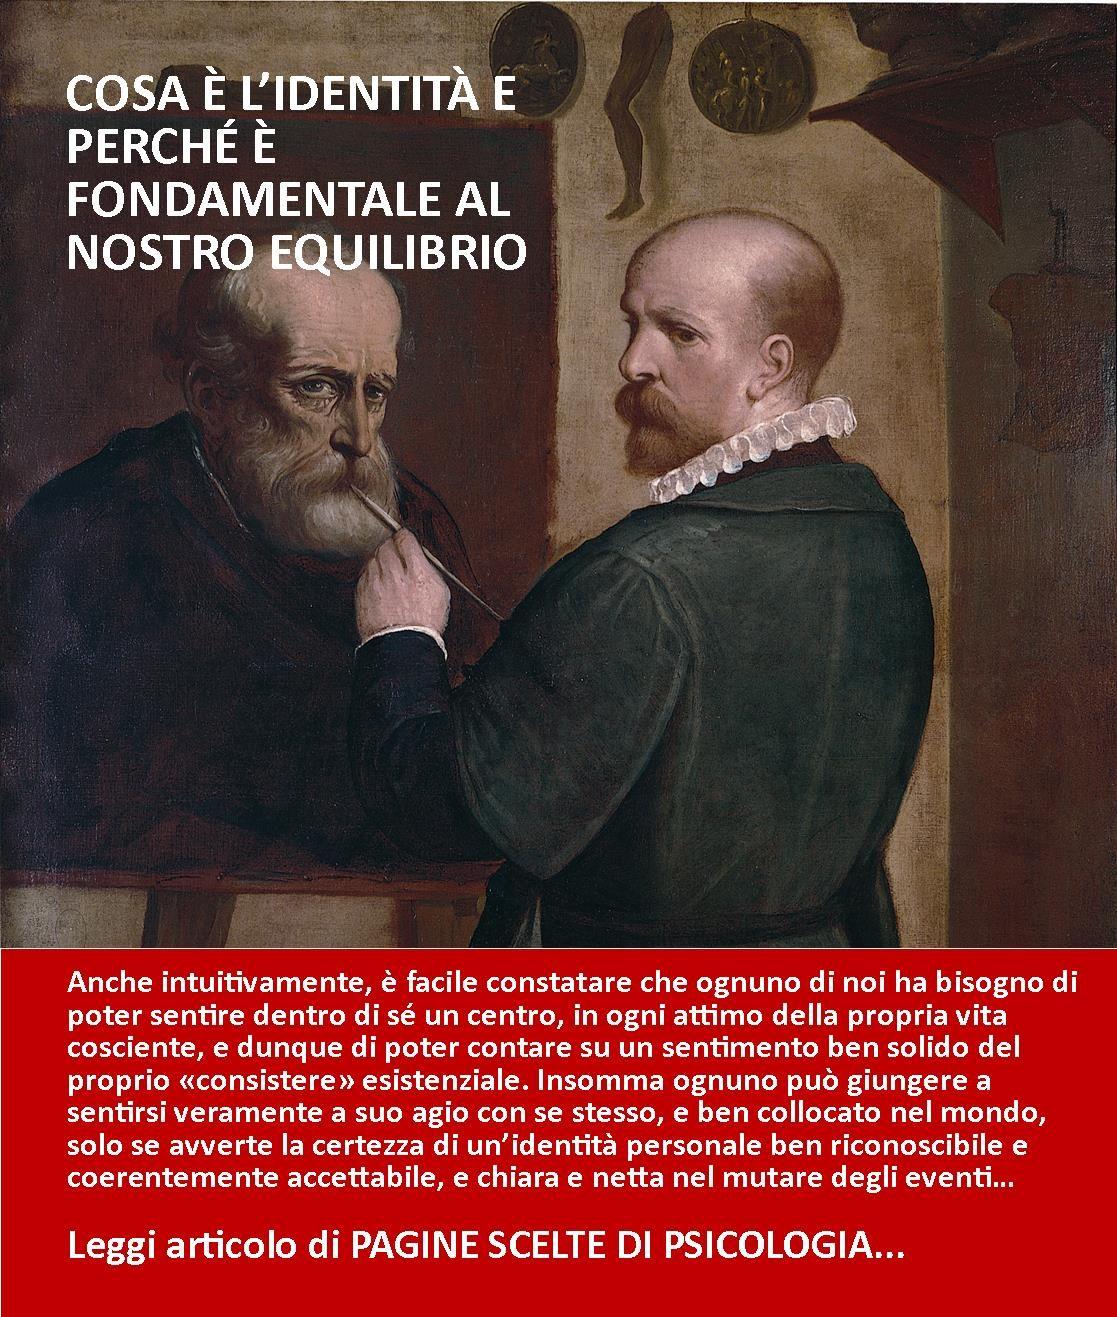 L'IDENTITA BASE DI NOI STESSI